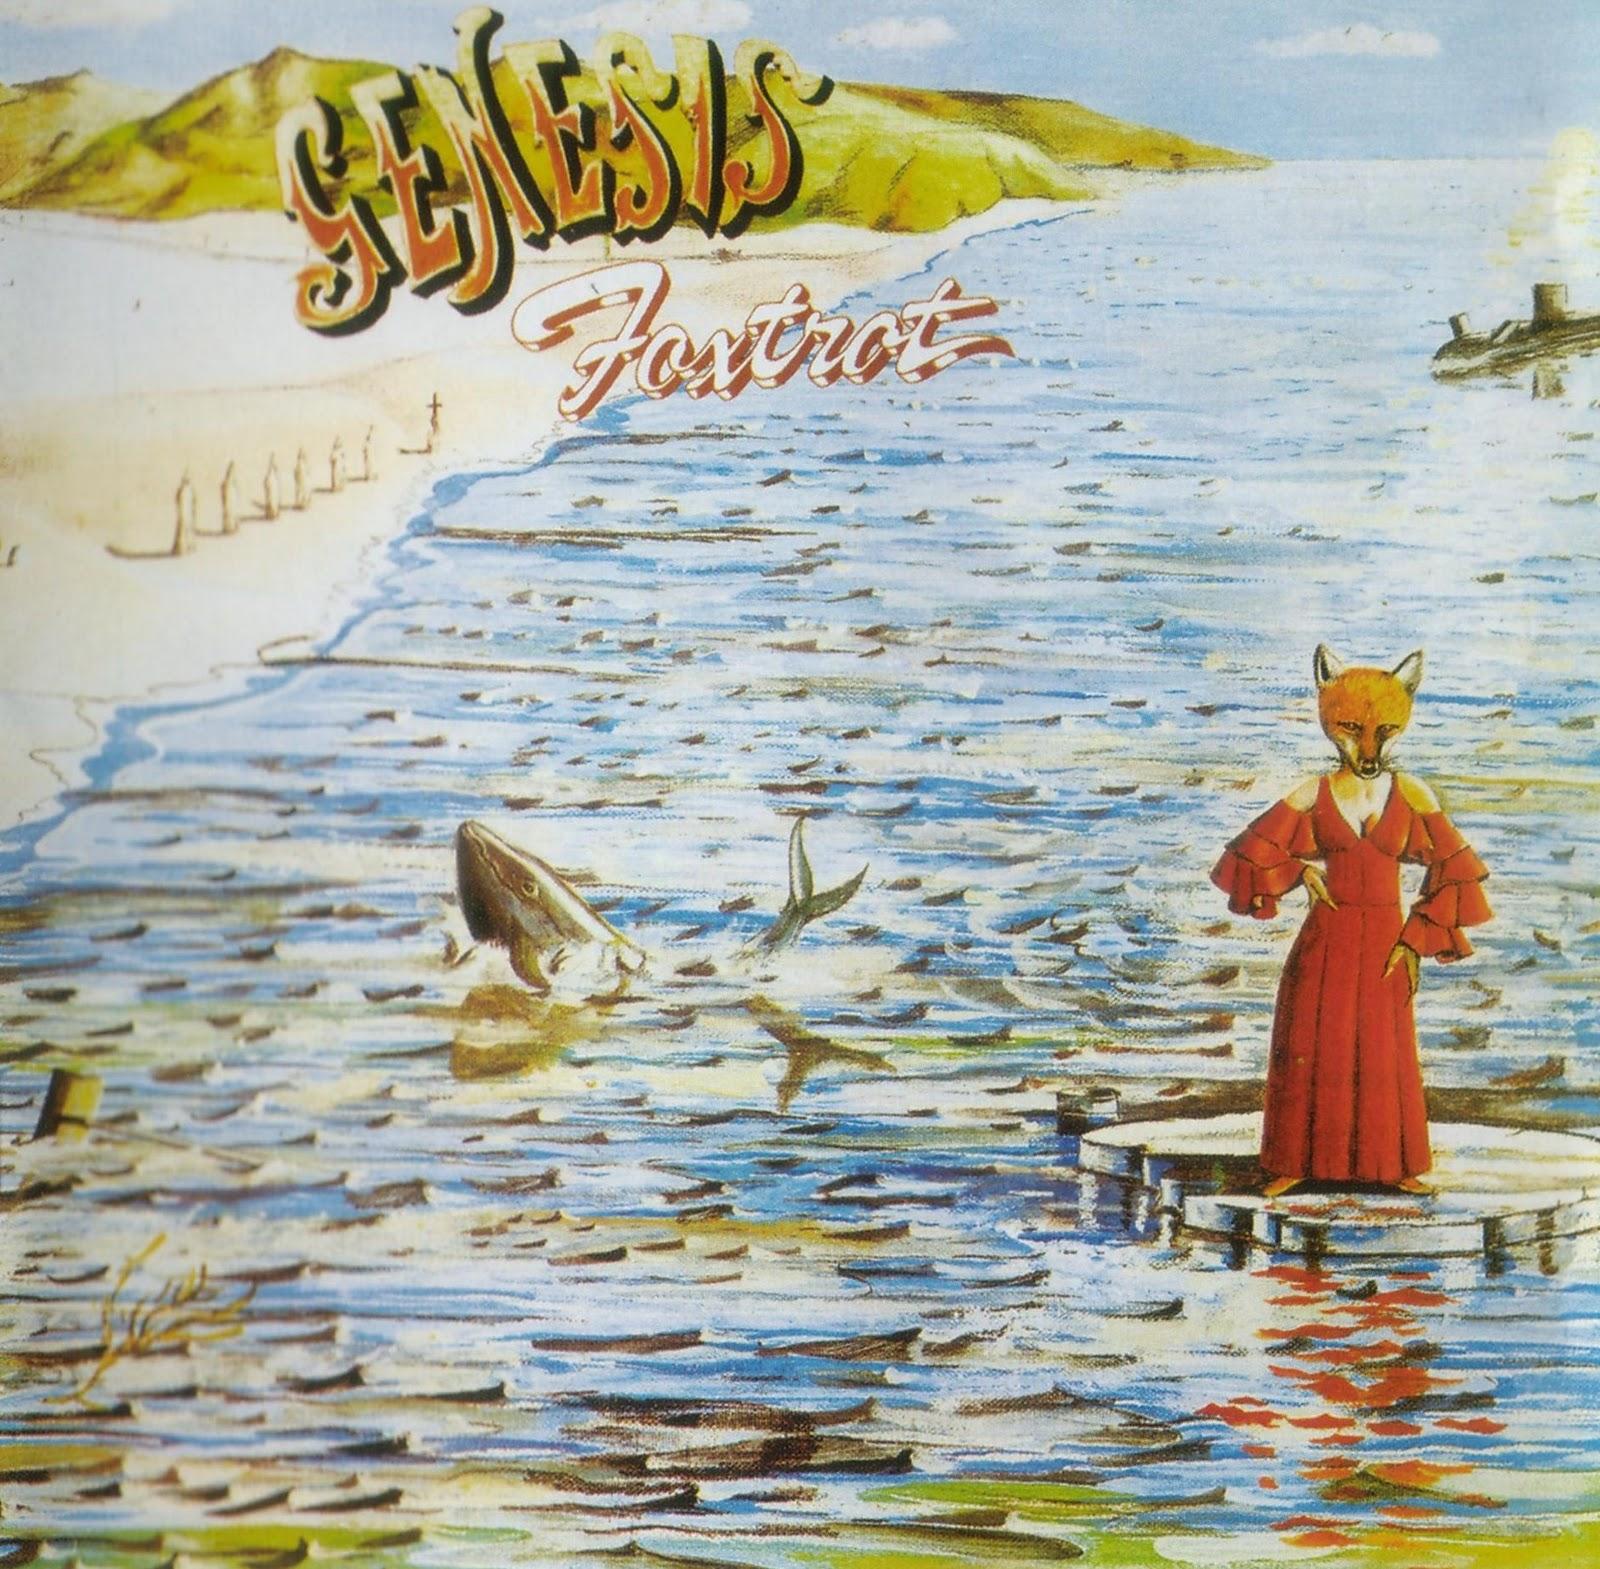 Genesis - Foxtrot-Front 1972